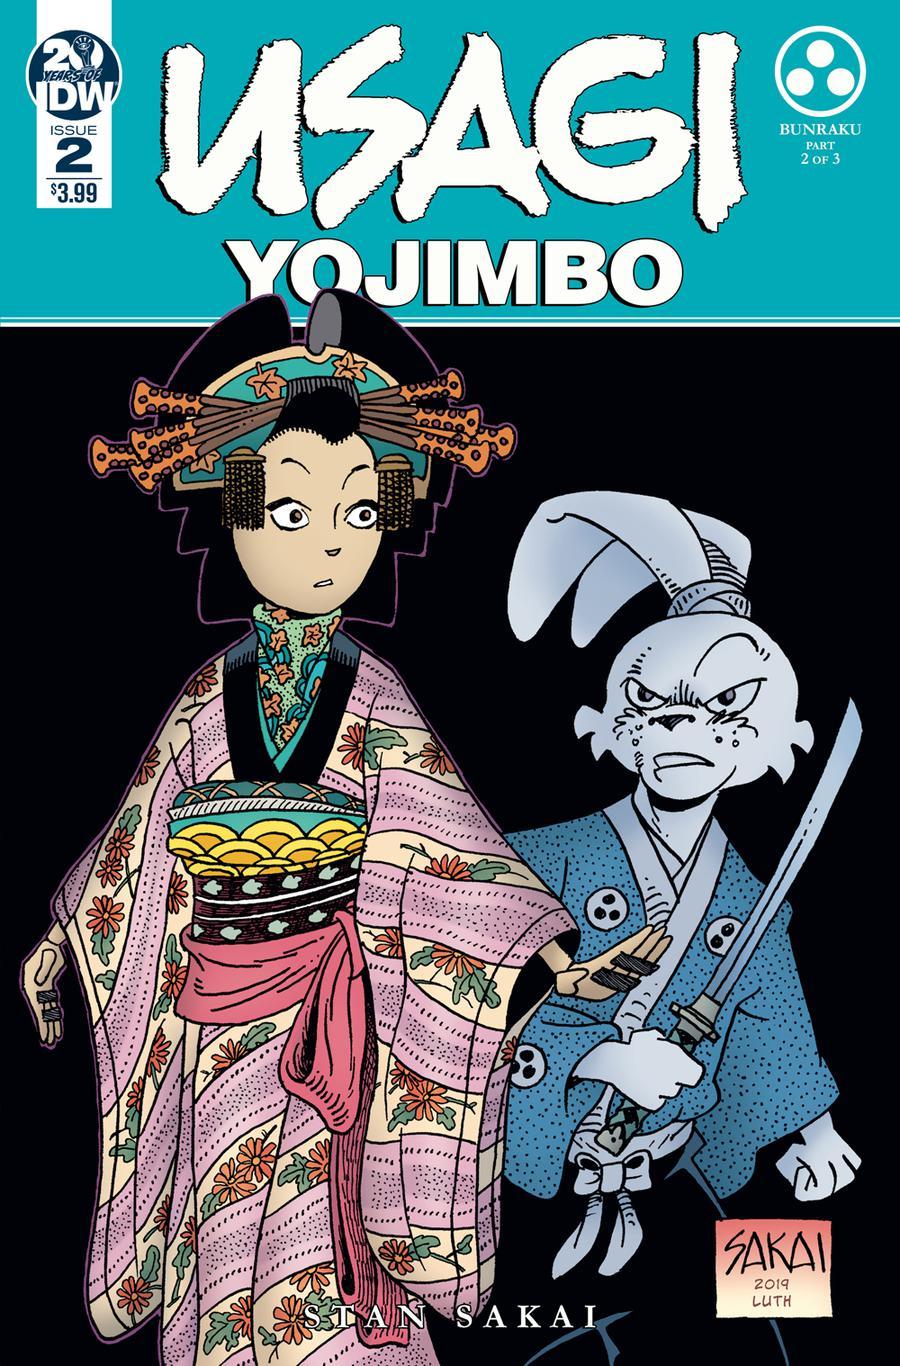 Usagi Yojimbo Vol 4 #2 Cover A 1st Ptg